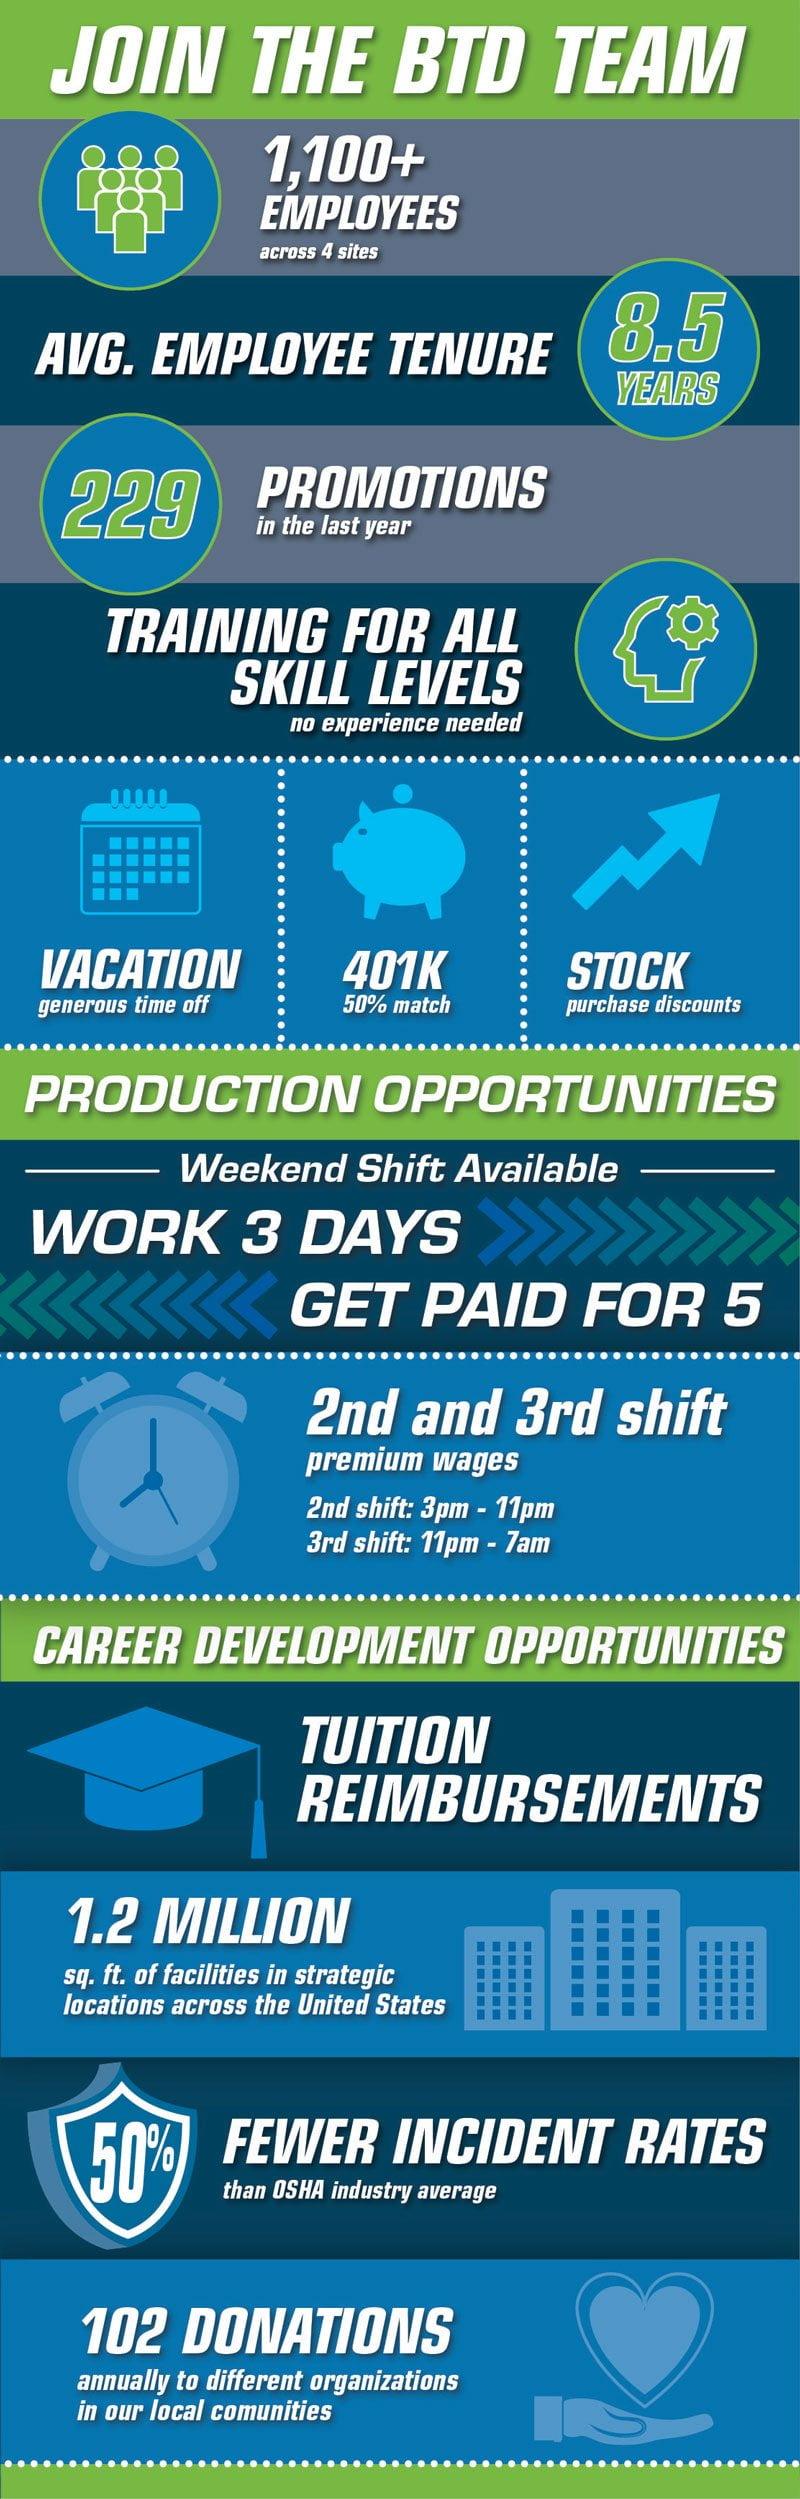 BTD Hiring Infographic